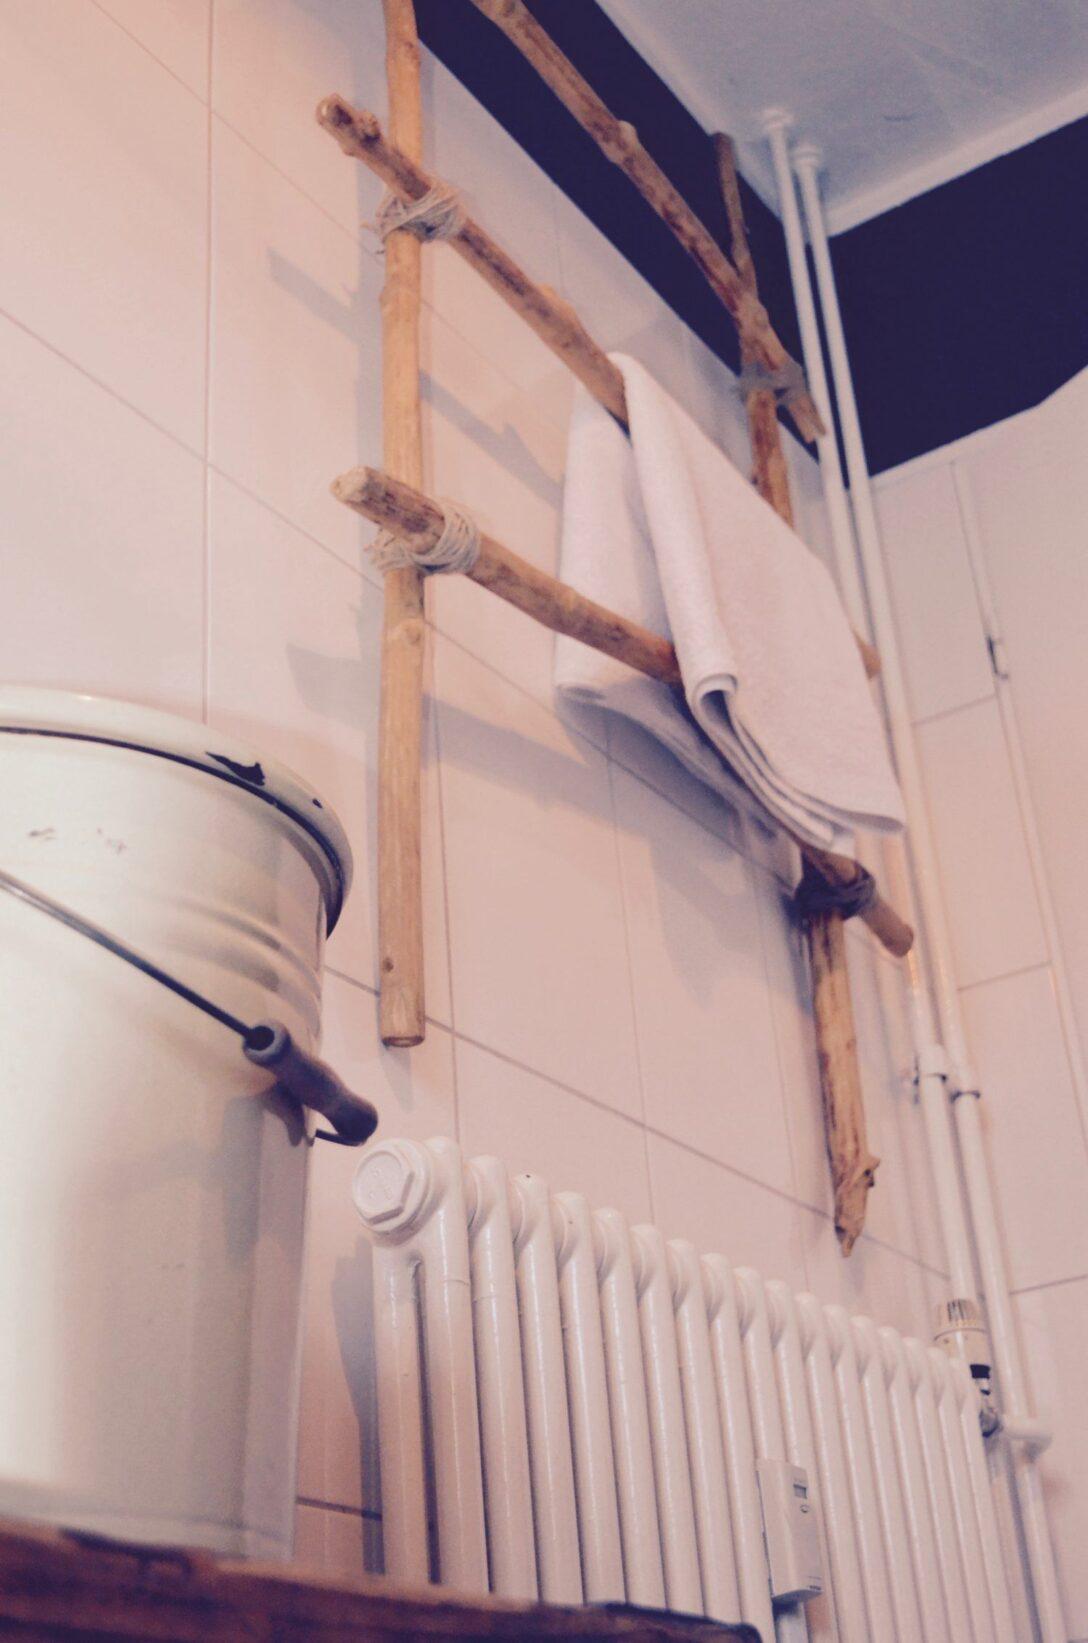 Large Size of Handtuchhalter Heizung Holz Heizkörper Bad Badezimmer Elektroheizkörper Für Küche Wohnzimmer Wohnzimmer Handtuchhalter Heizkörper